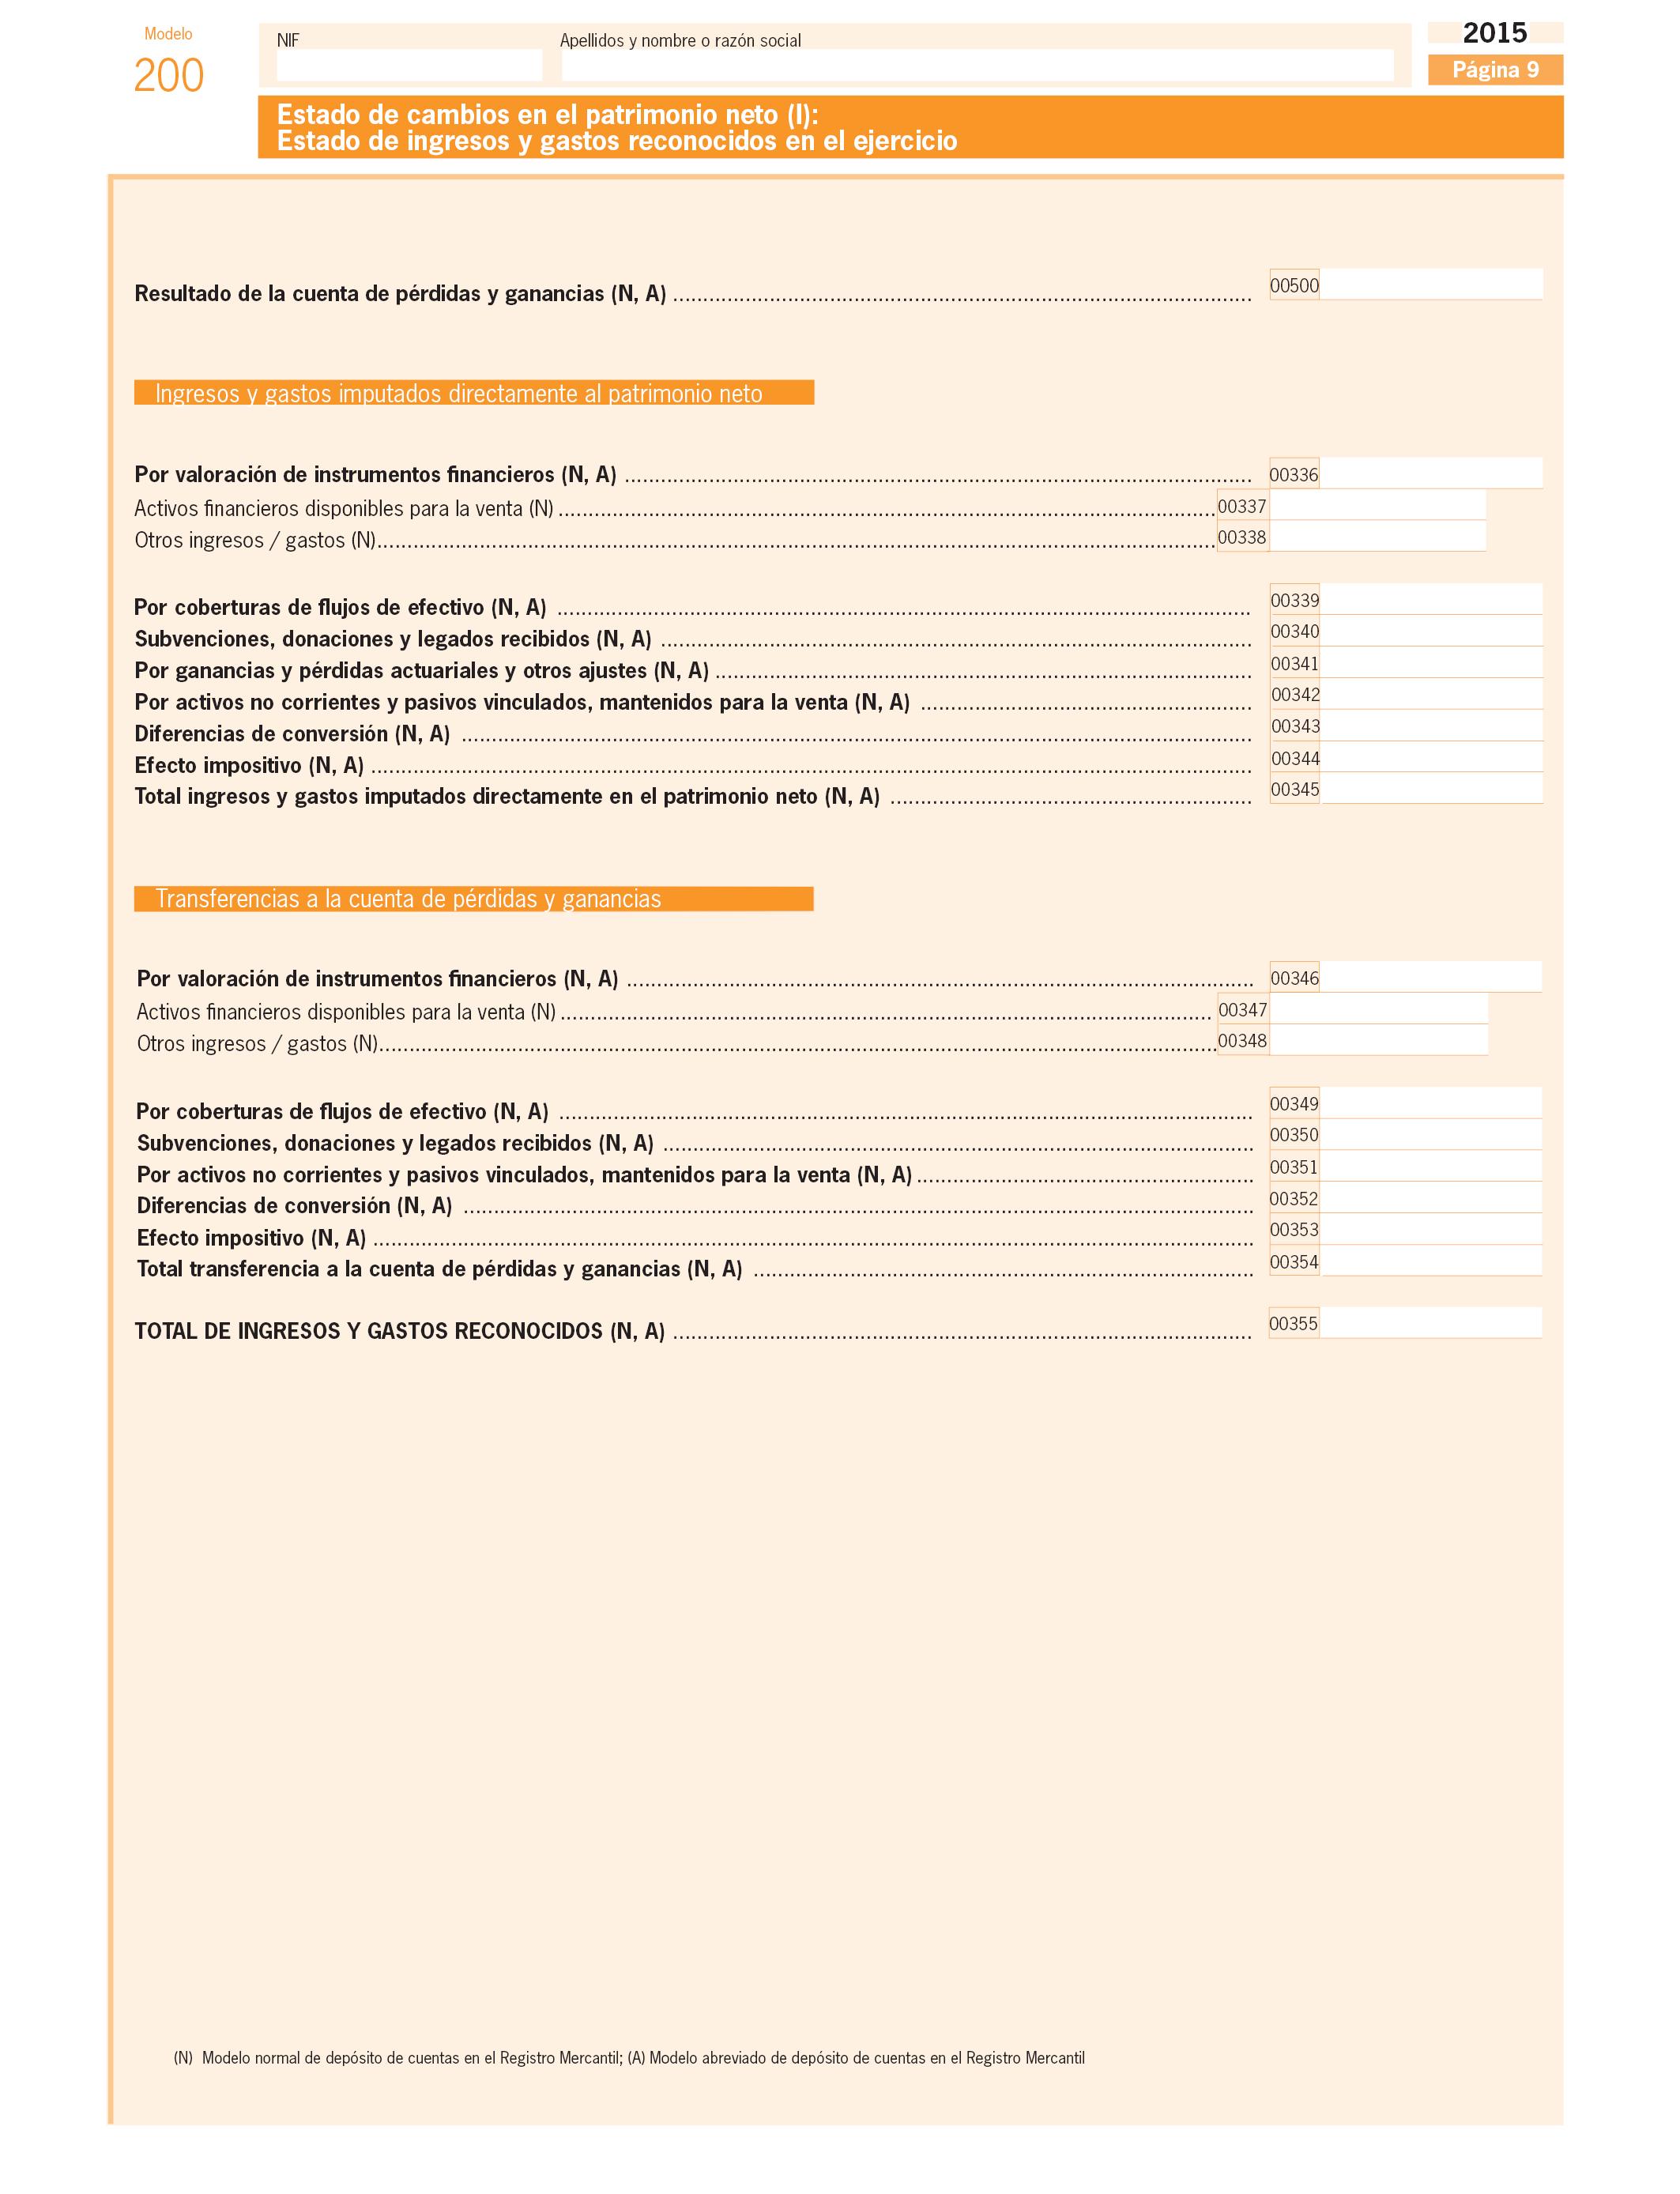 BOE.es - Documento BOE-A-2016-5529